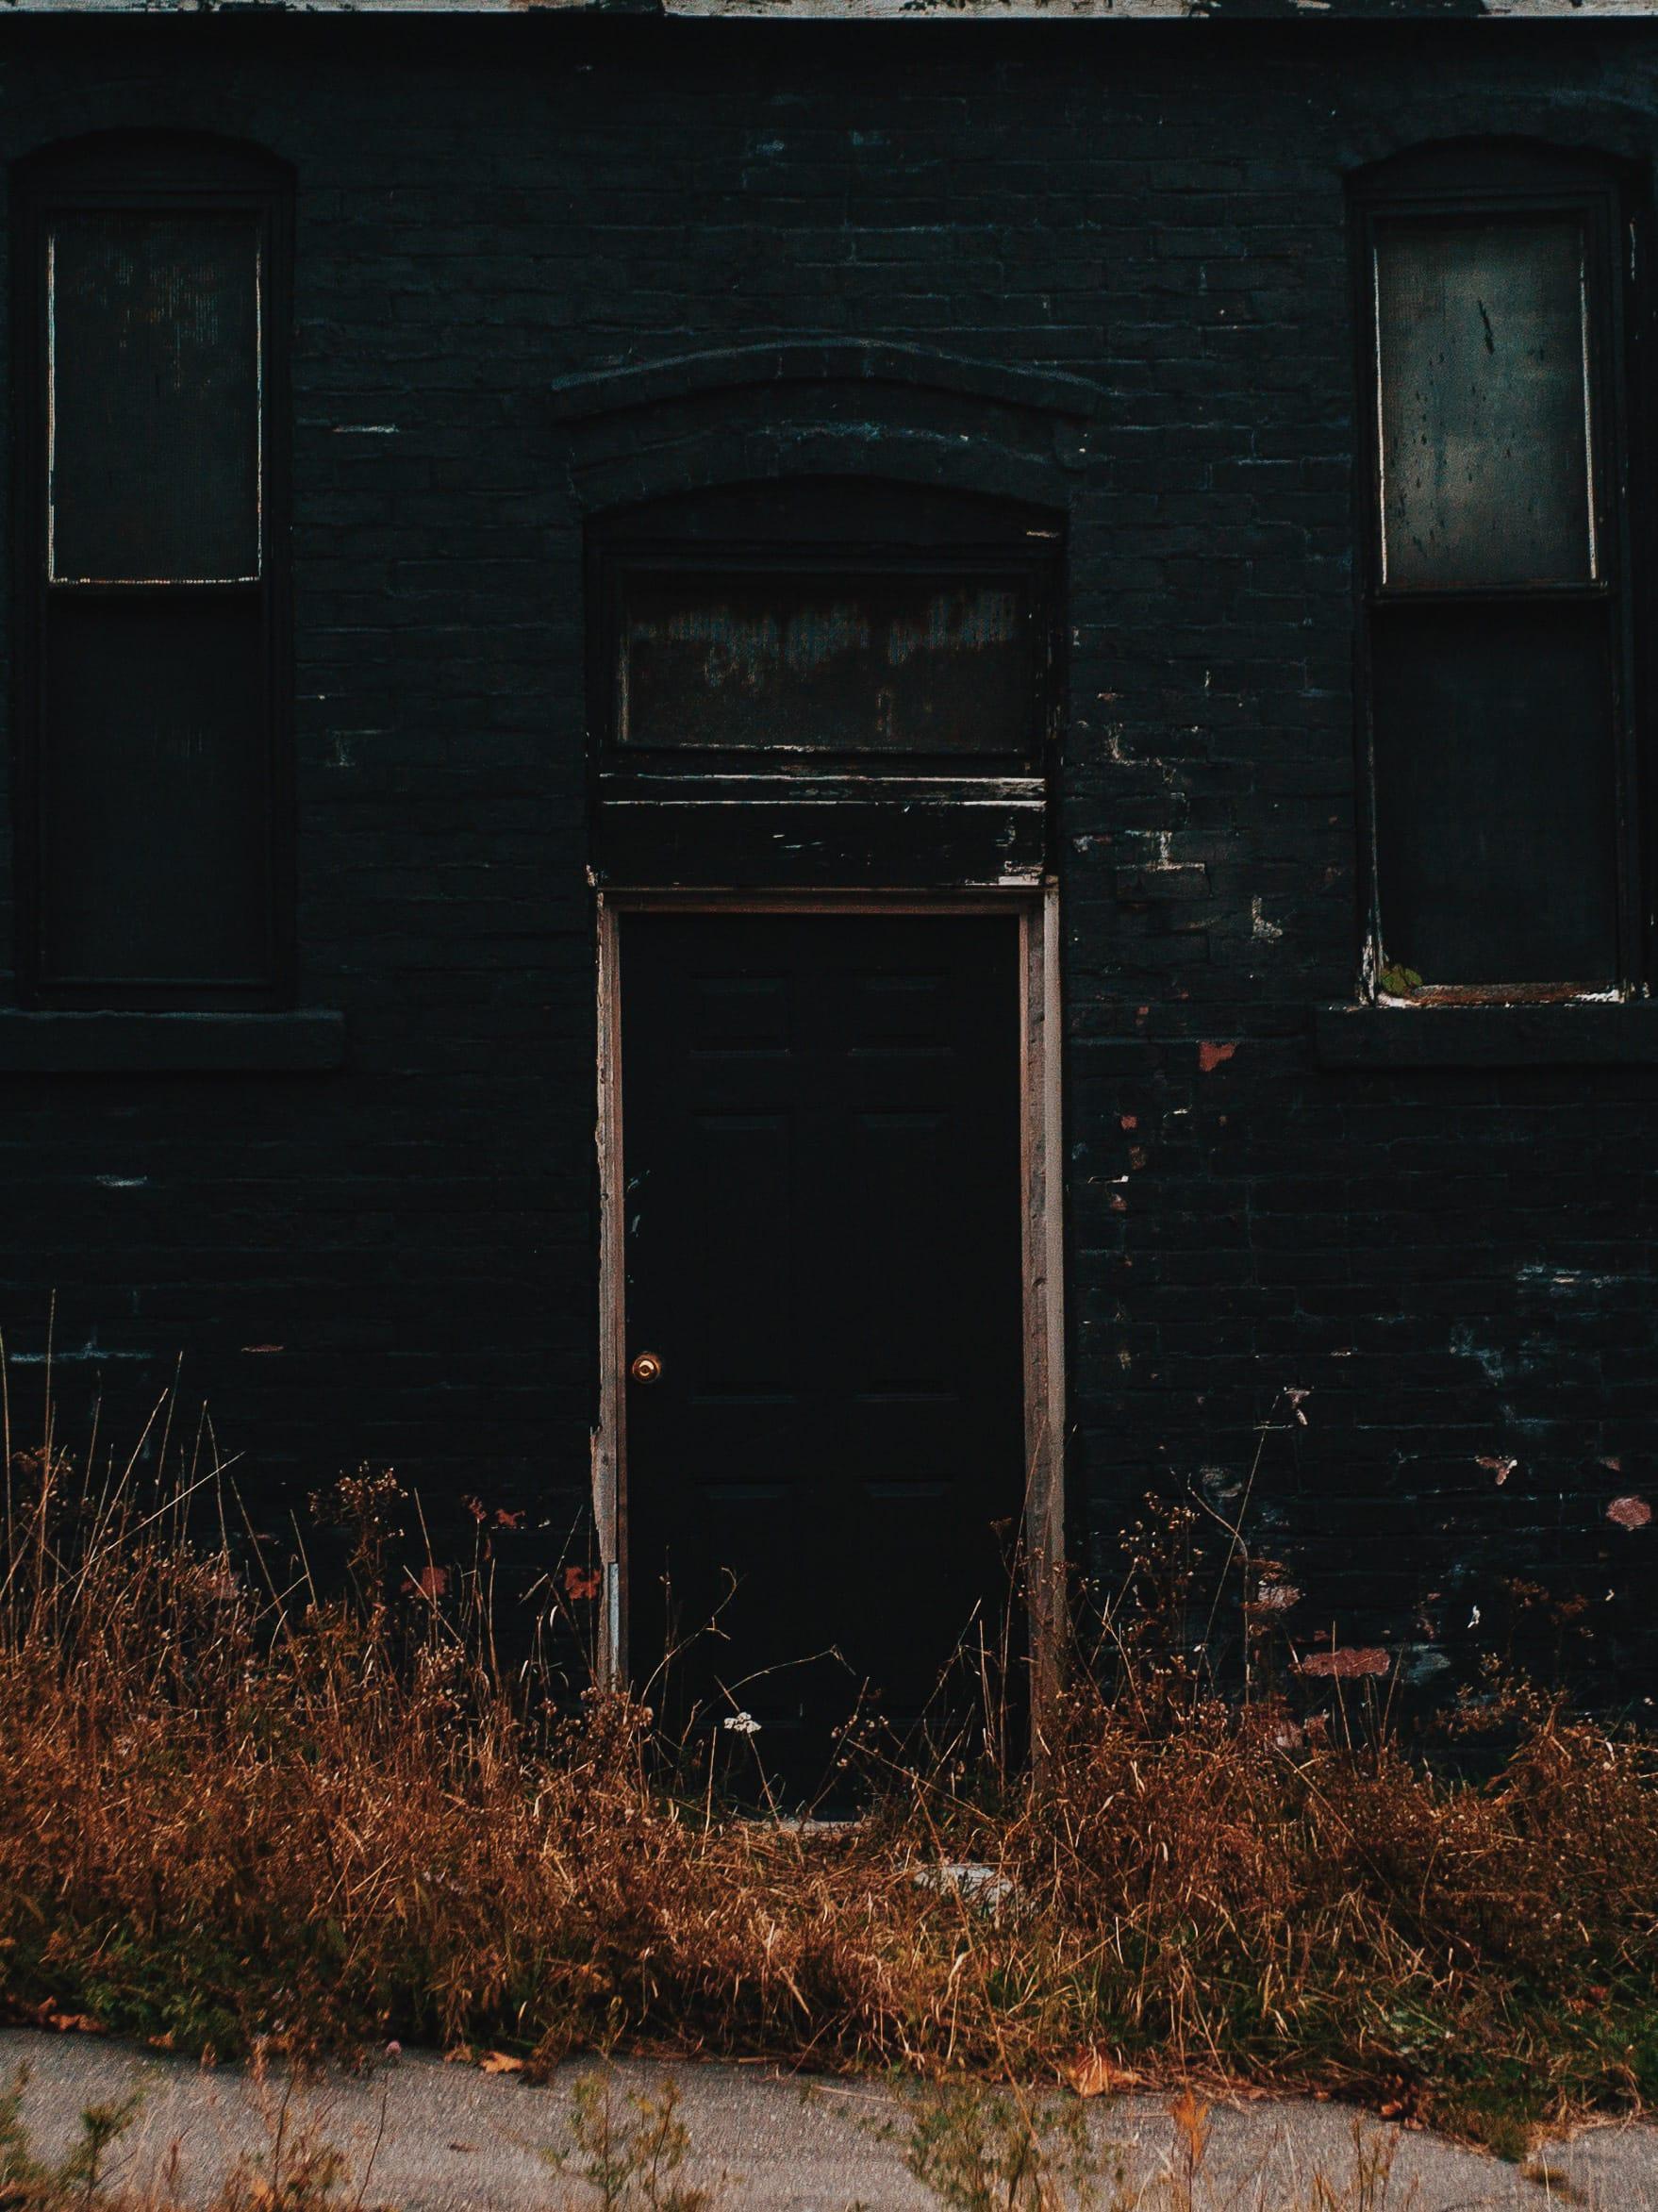 A photograph depicting Black House Door